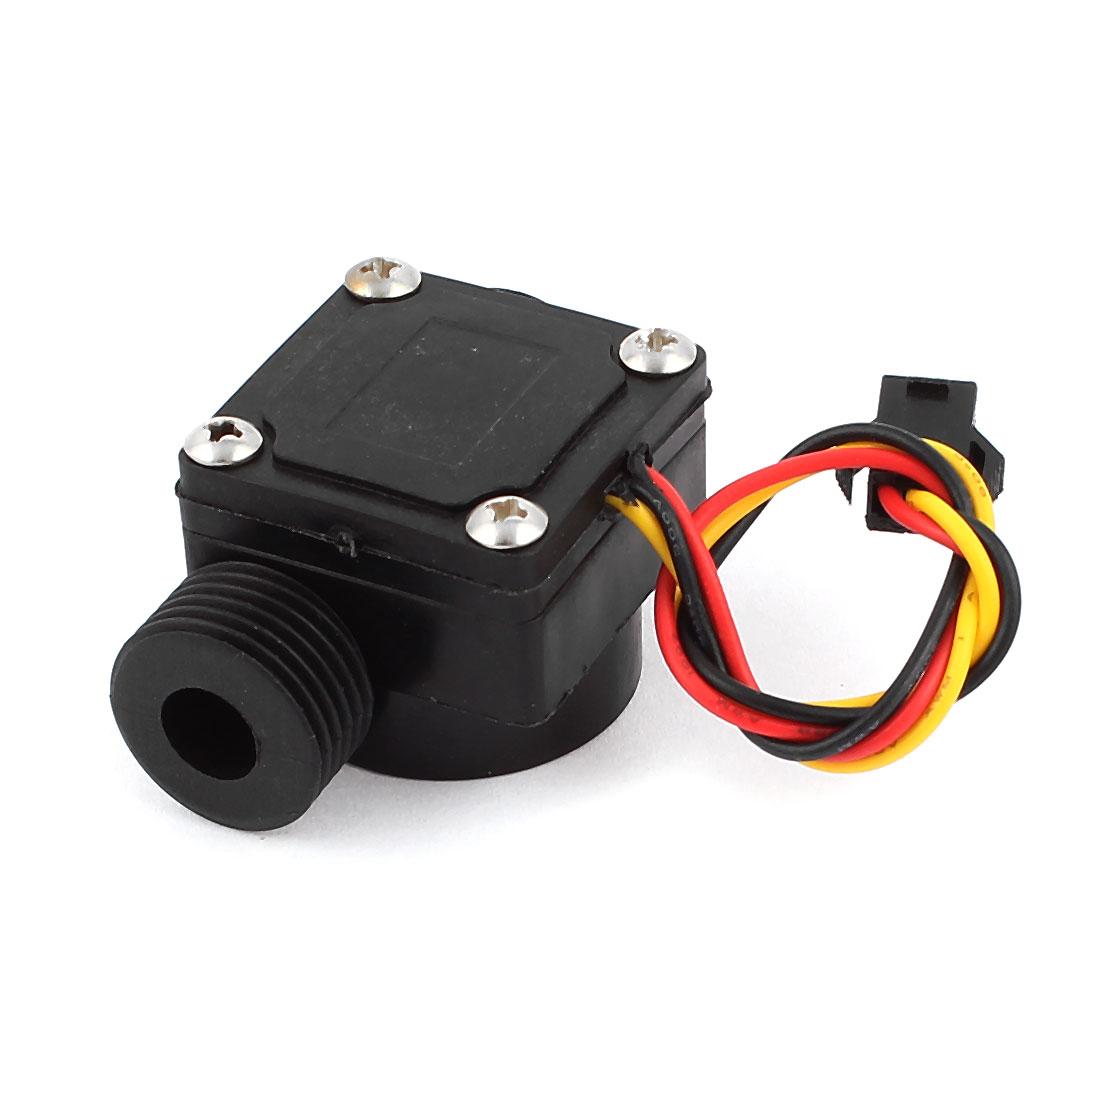 0.5-30L/Min DC 12V Water Heater Flow Sensor Switch Flowmeter Counter